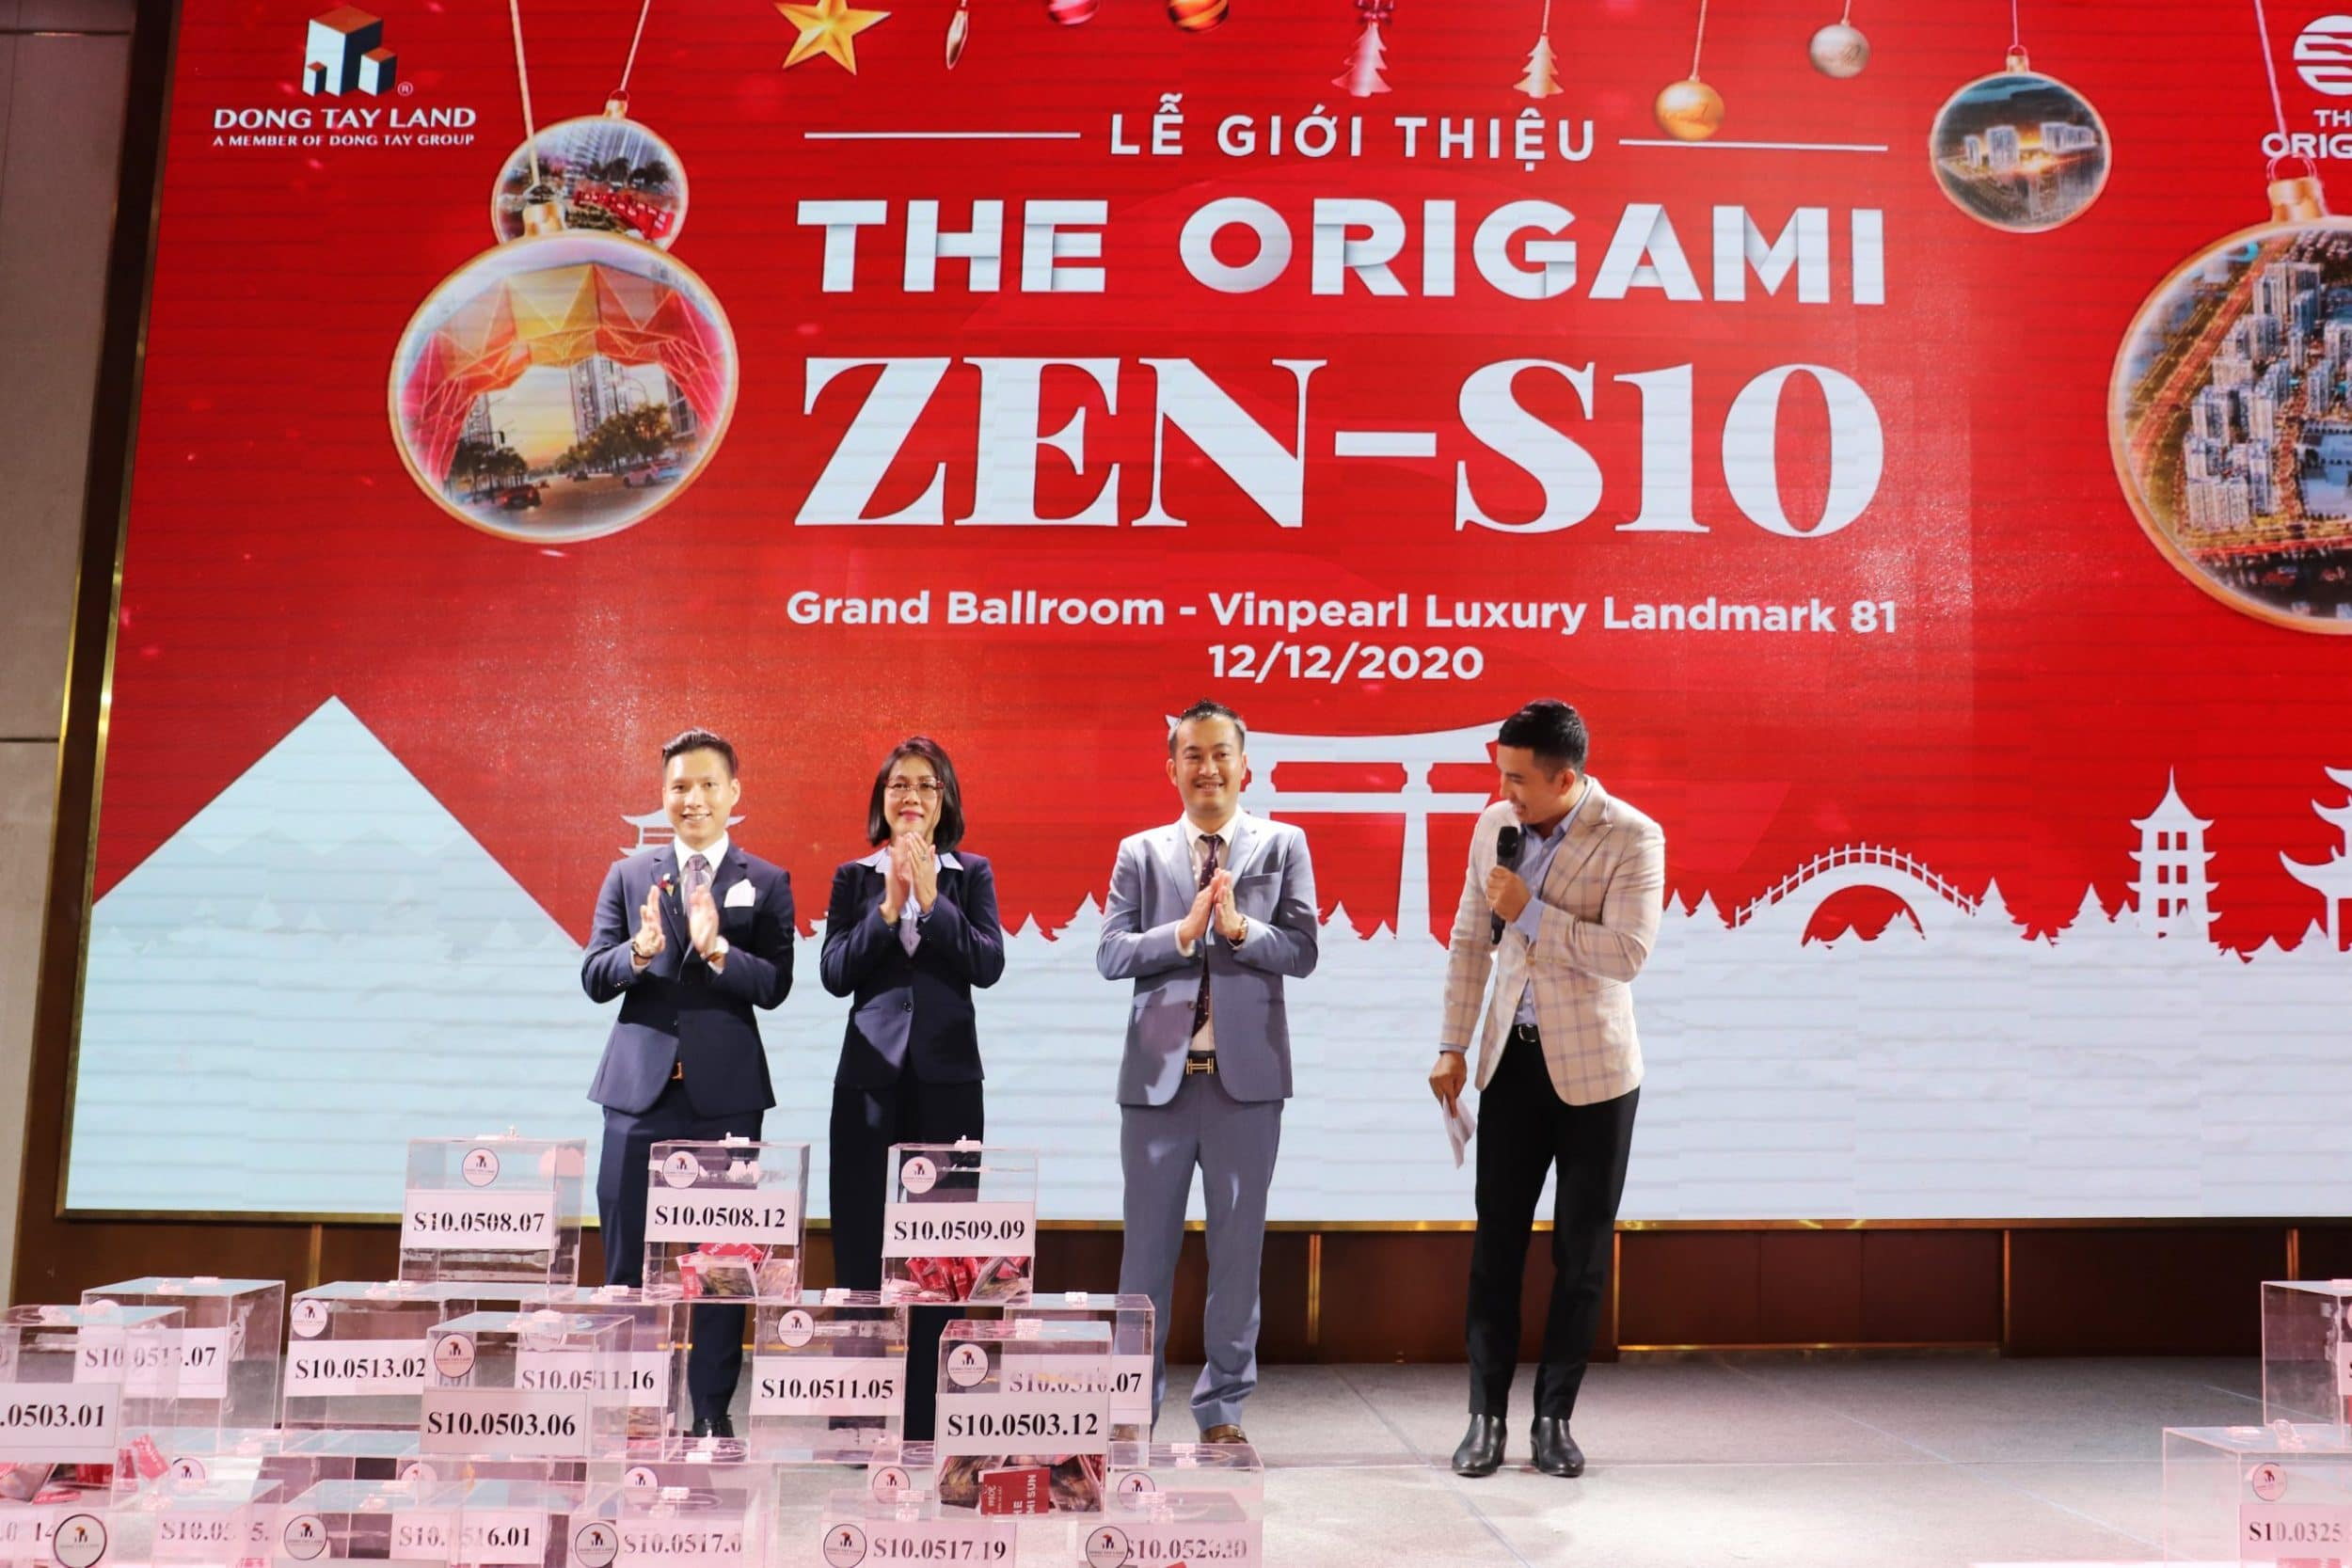 Sự kiện mở bán S10 & S6 The Origami